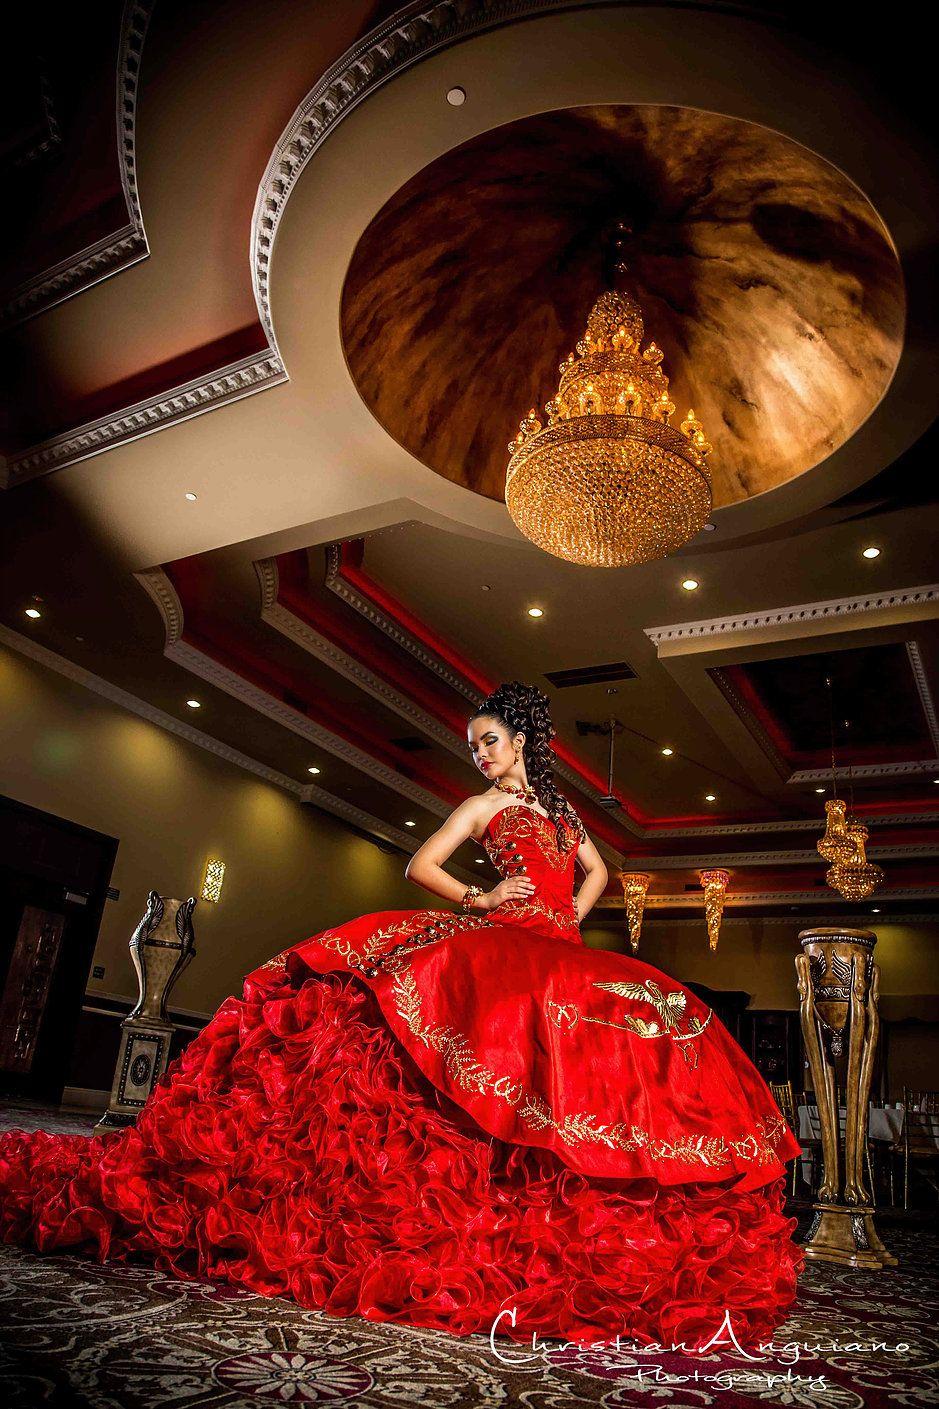 Quincea 241 Era Dresses Costum Charro Theme Princess